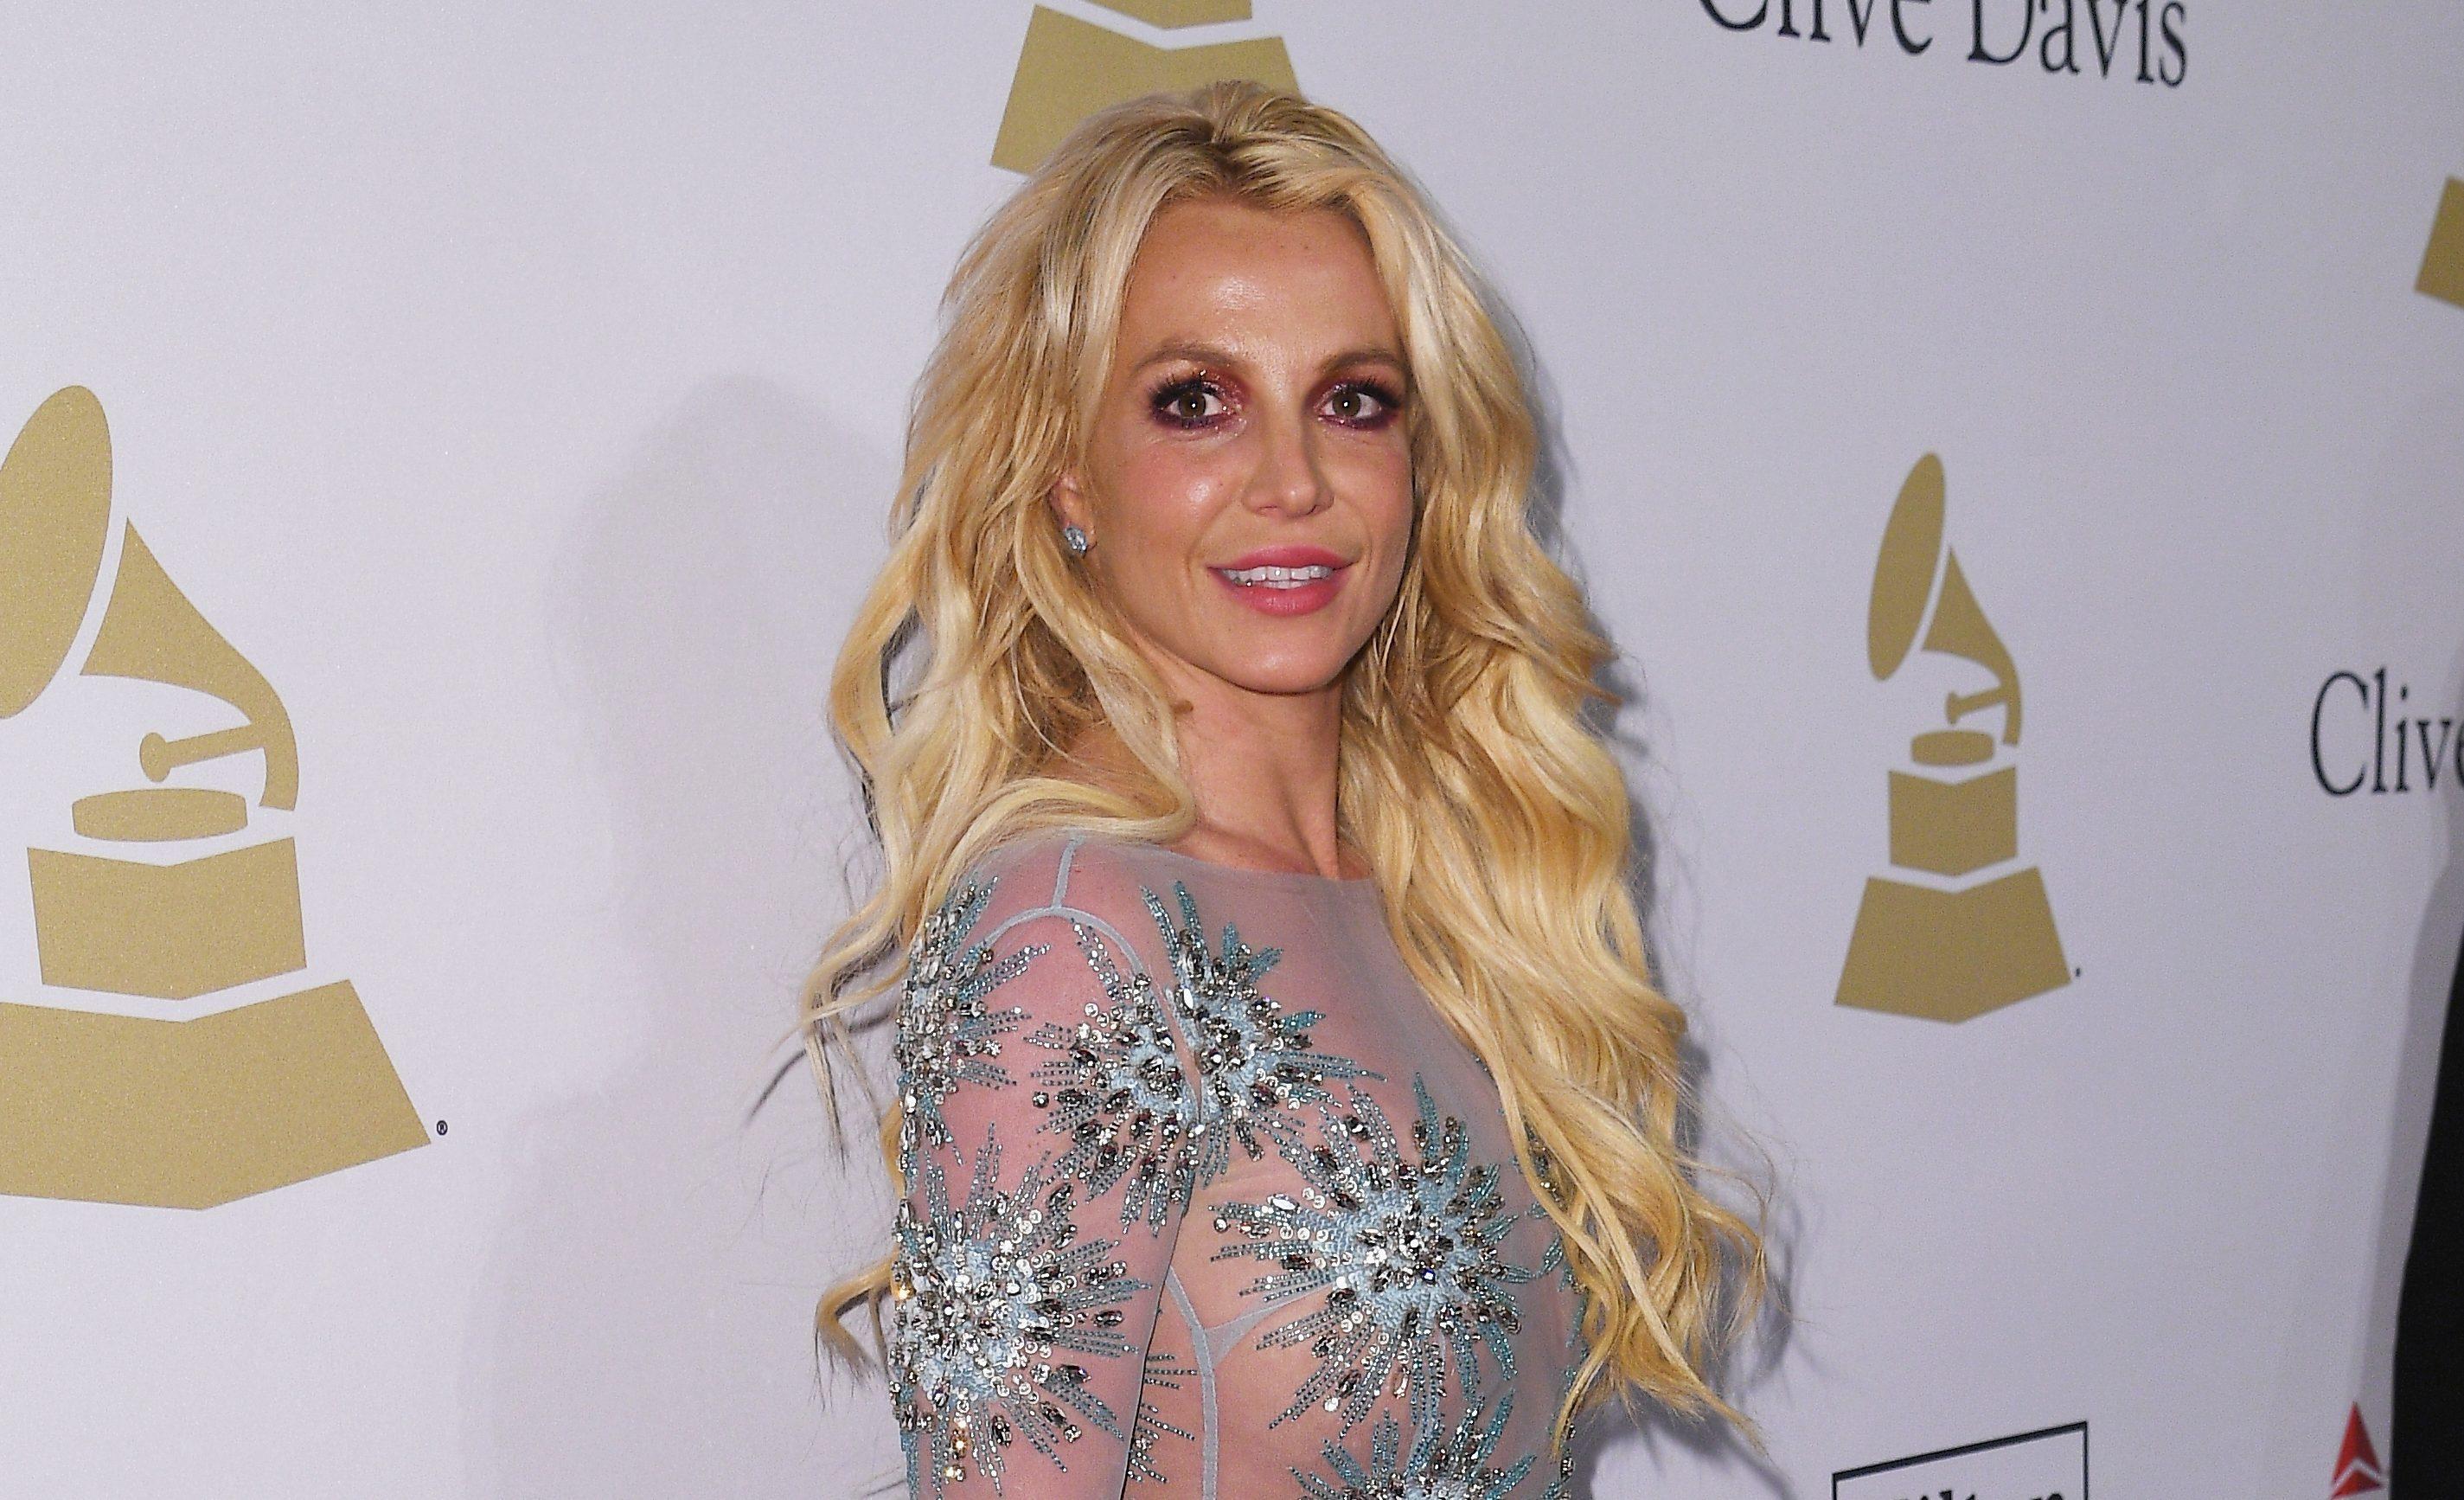 Singer Britney Spears (Kevork Djansezian/Getty Images)